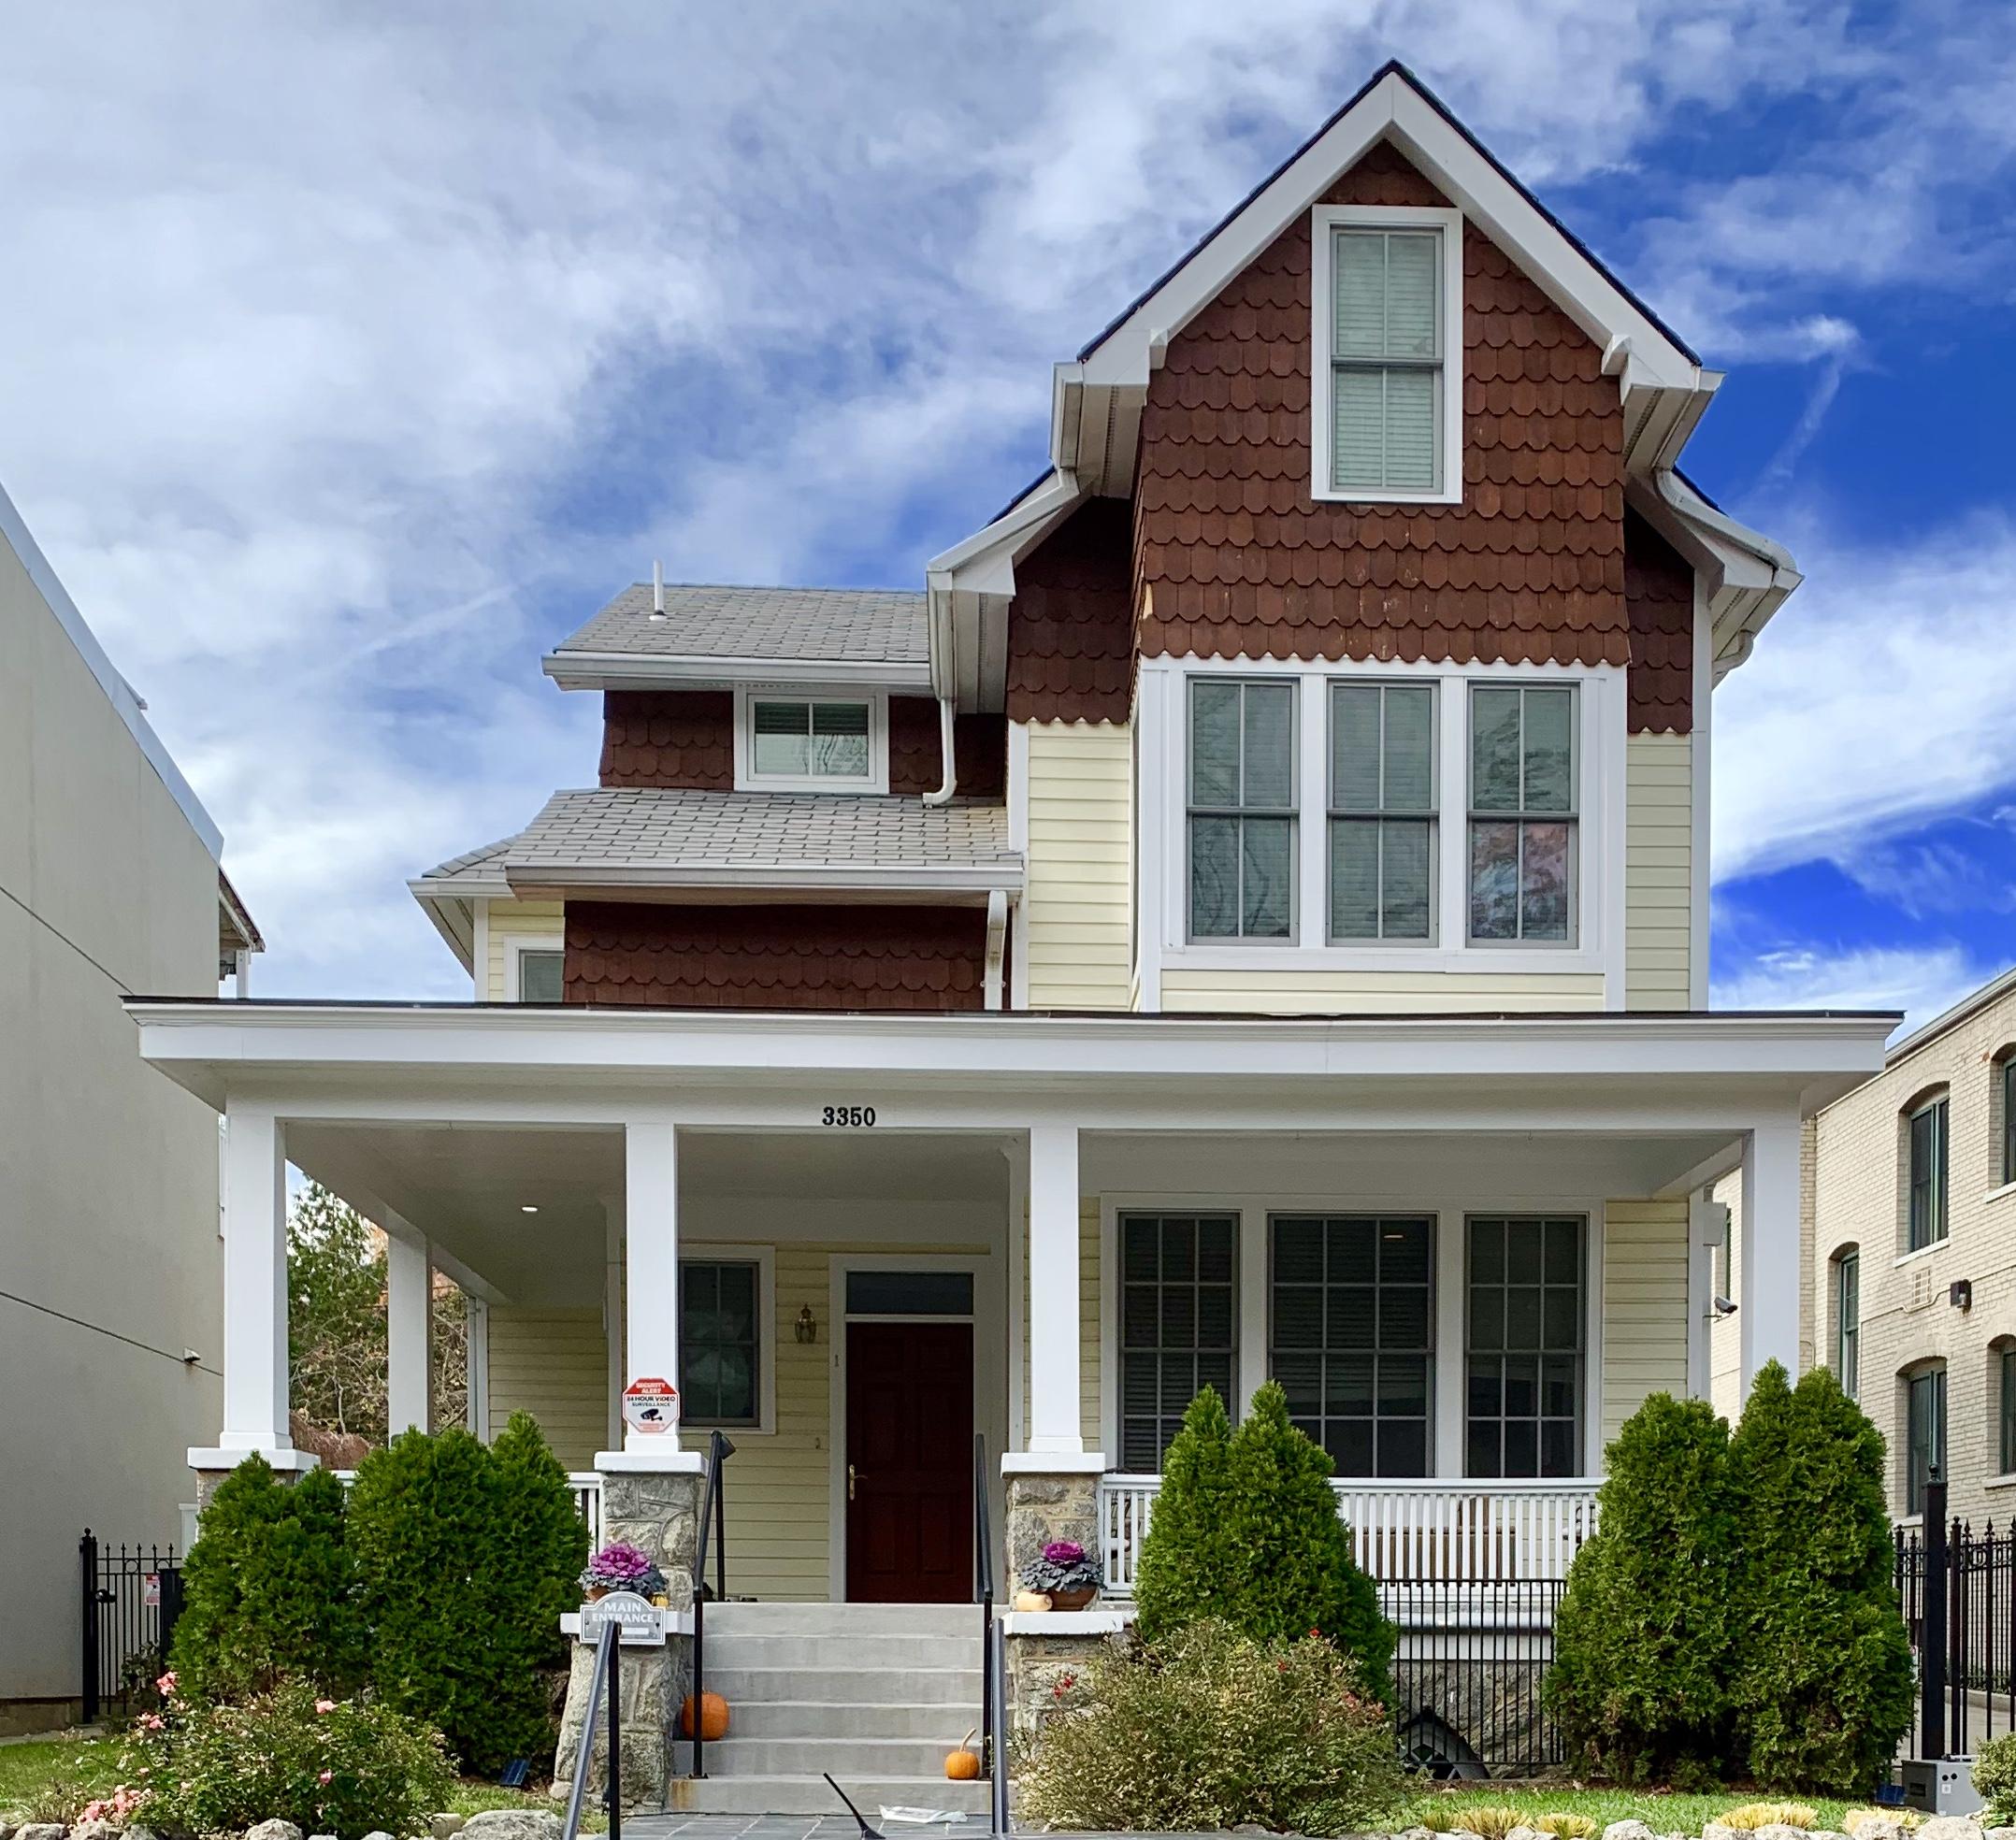 Craftsman Homes in Washington, DC. 17th Street in Mount Pleasant